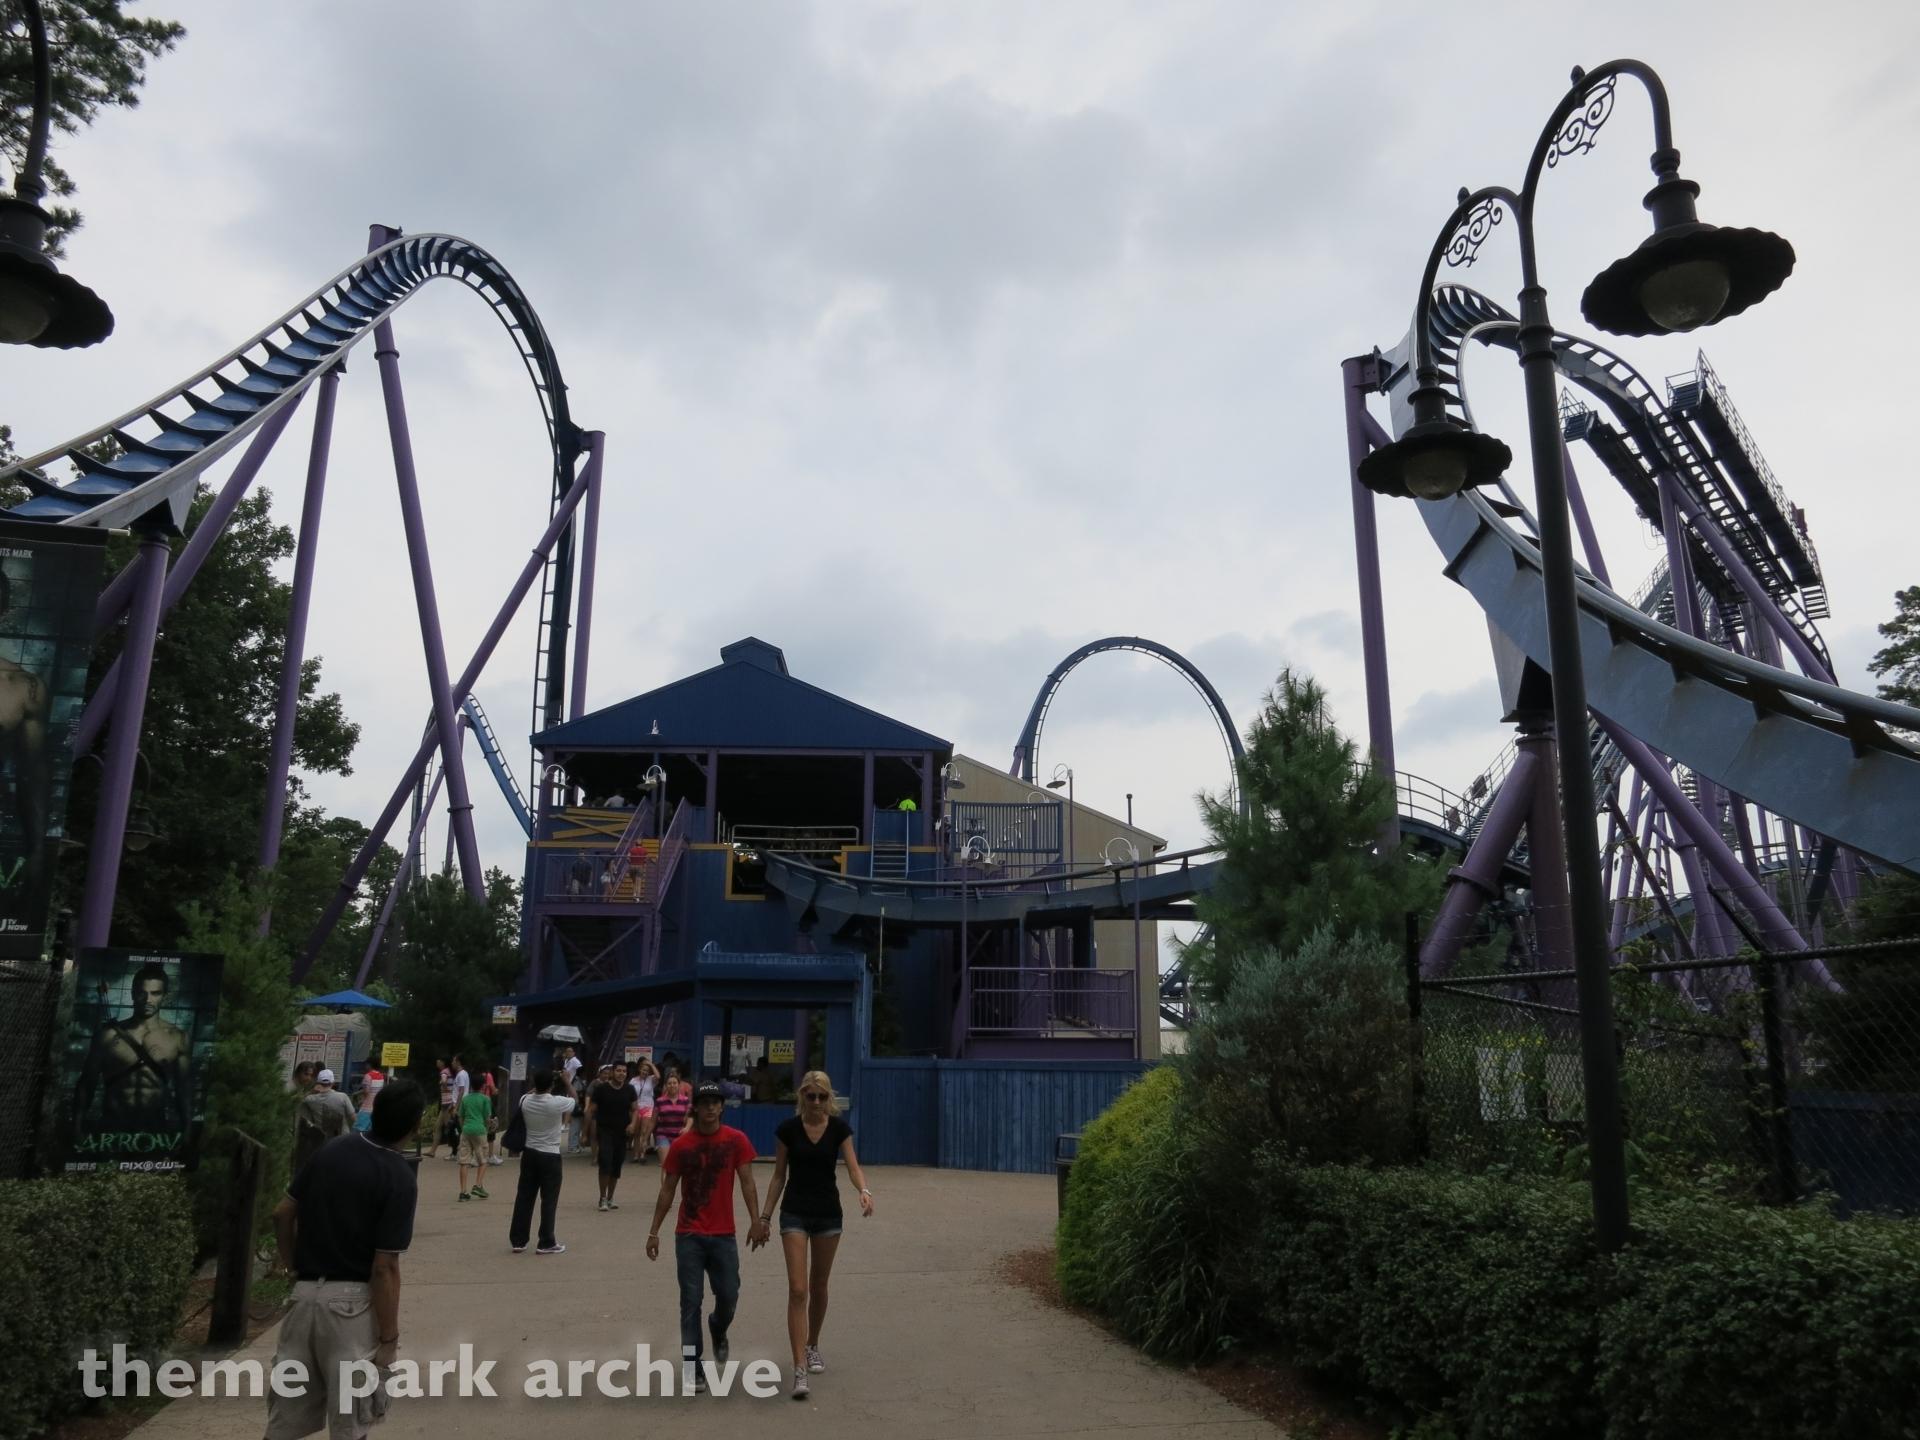 Bizarro at Six Flags Great Adventure